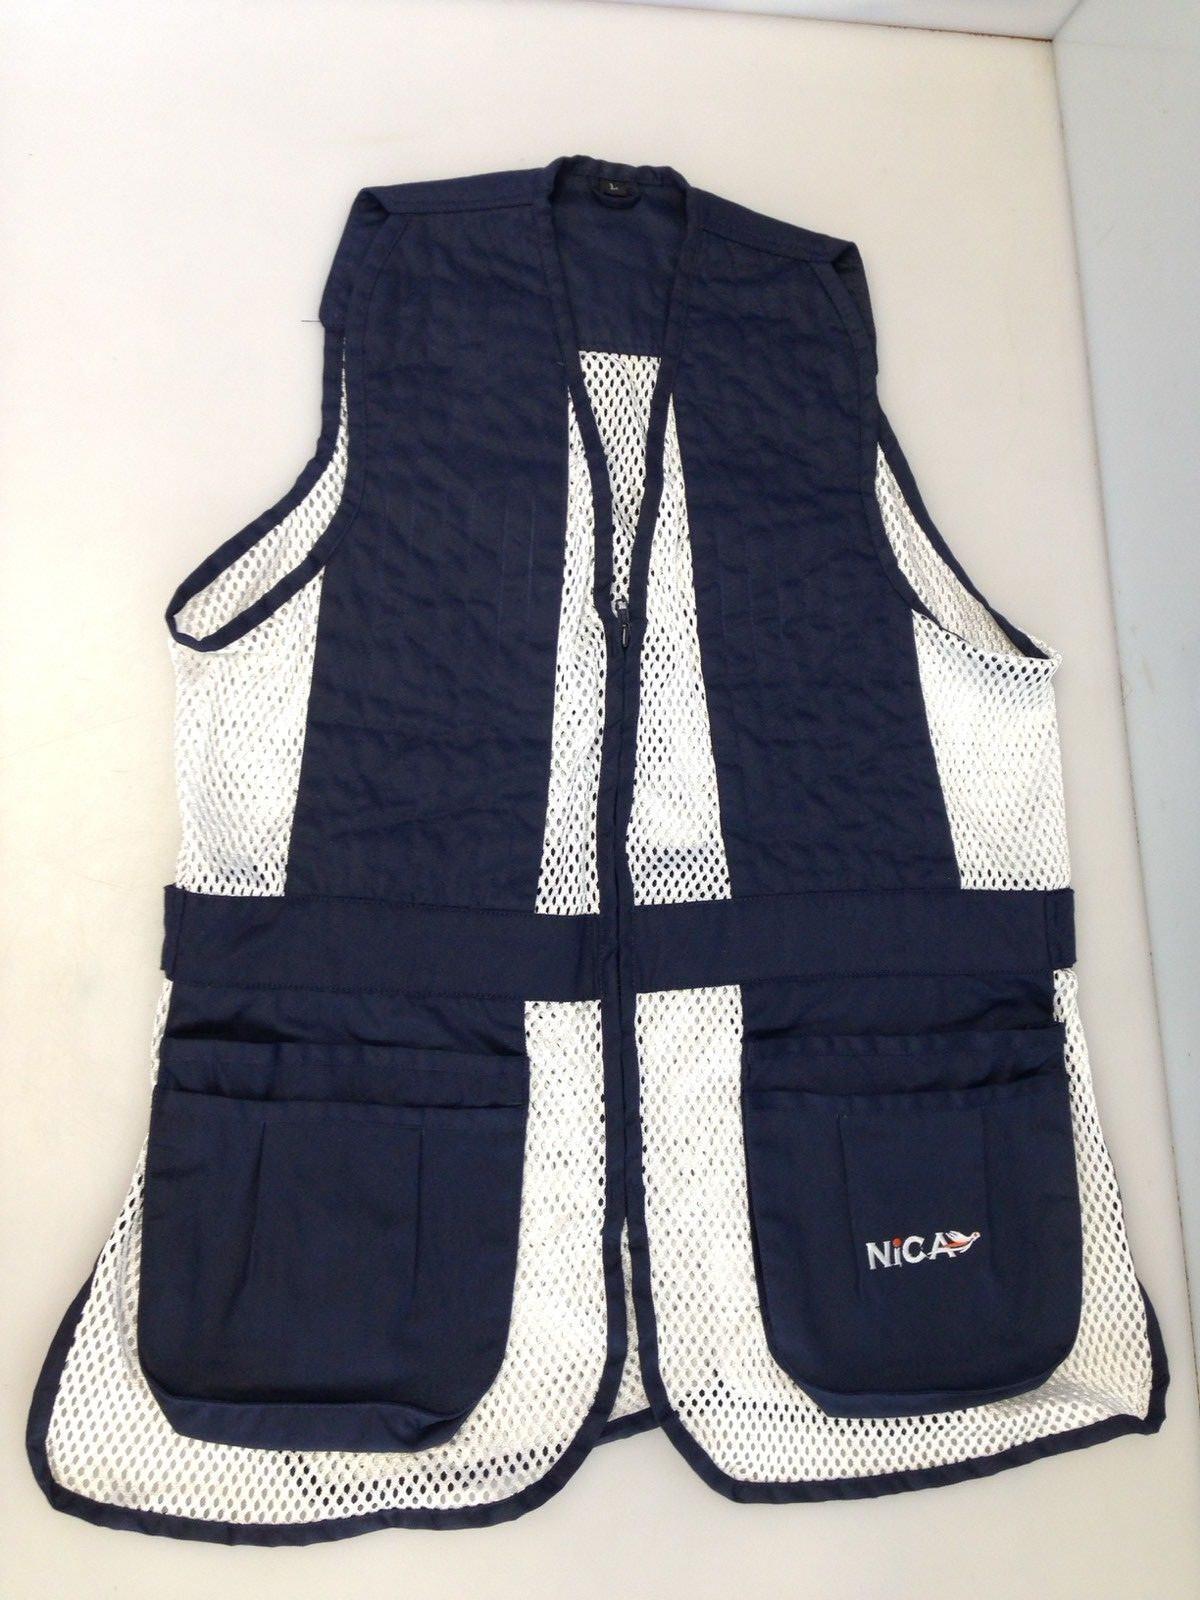 NICA Ambi Shooting Vest - Large - Navy - VNI501-NAV-L